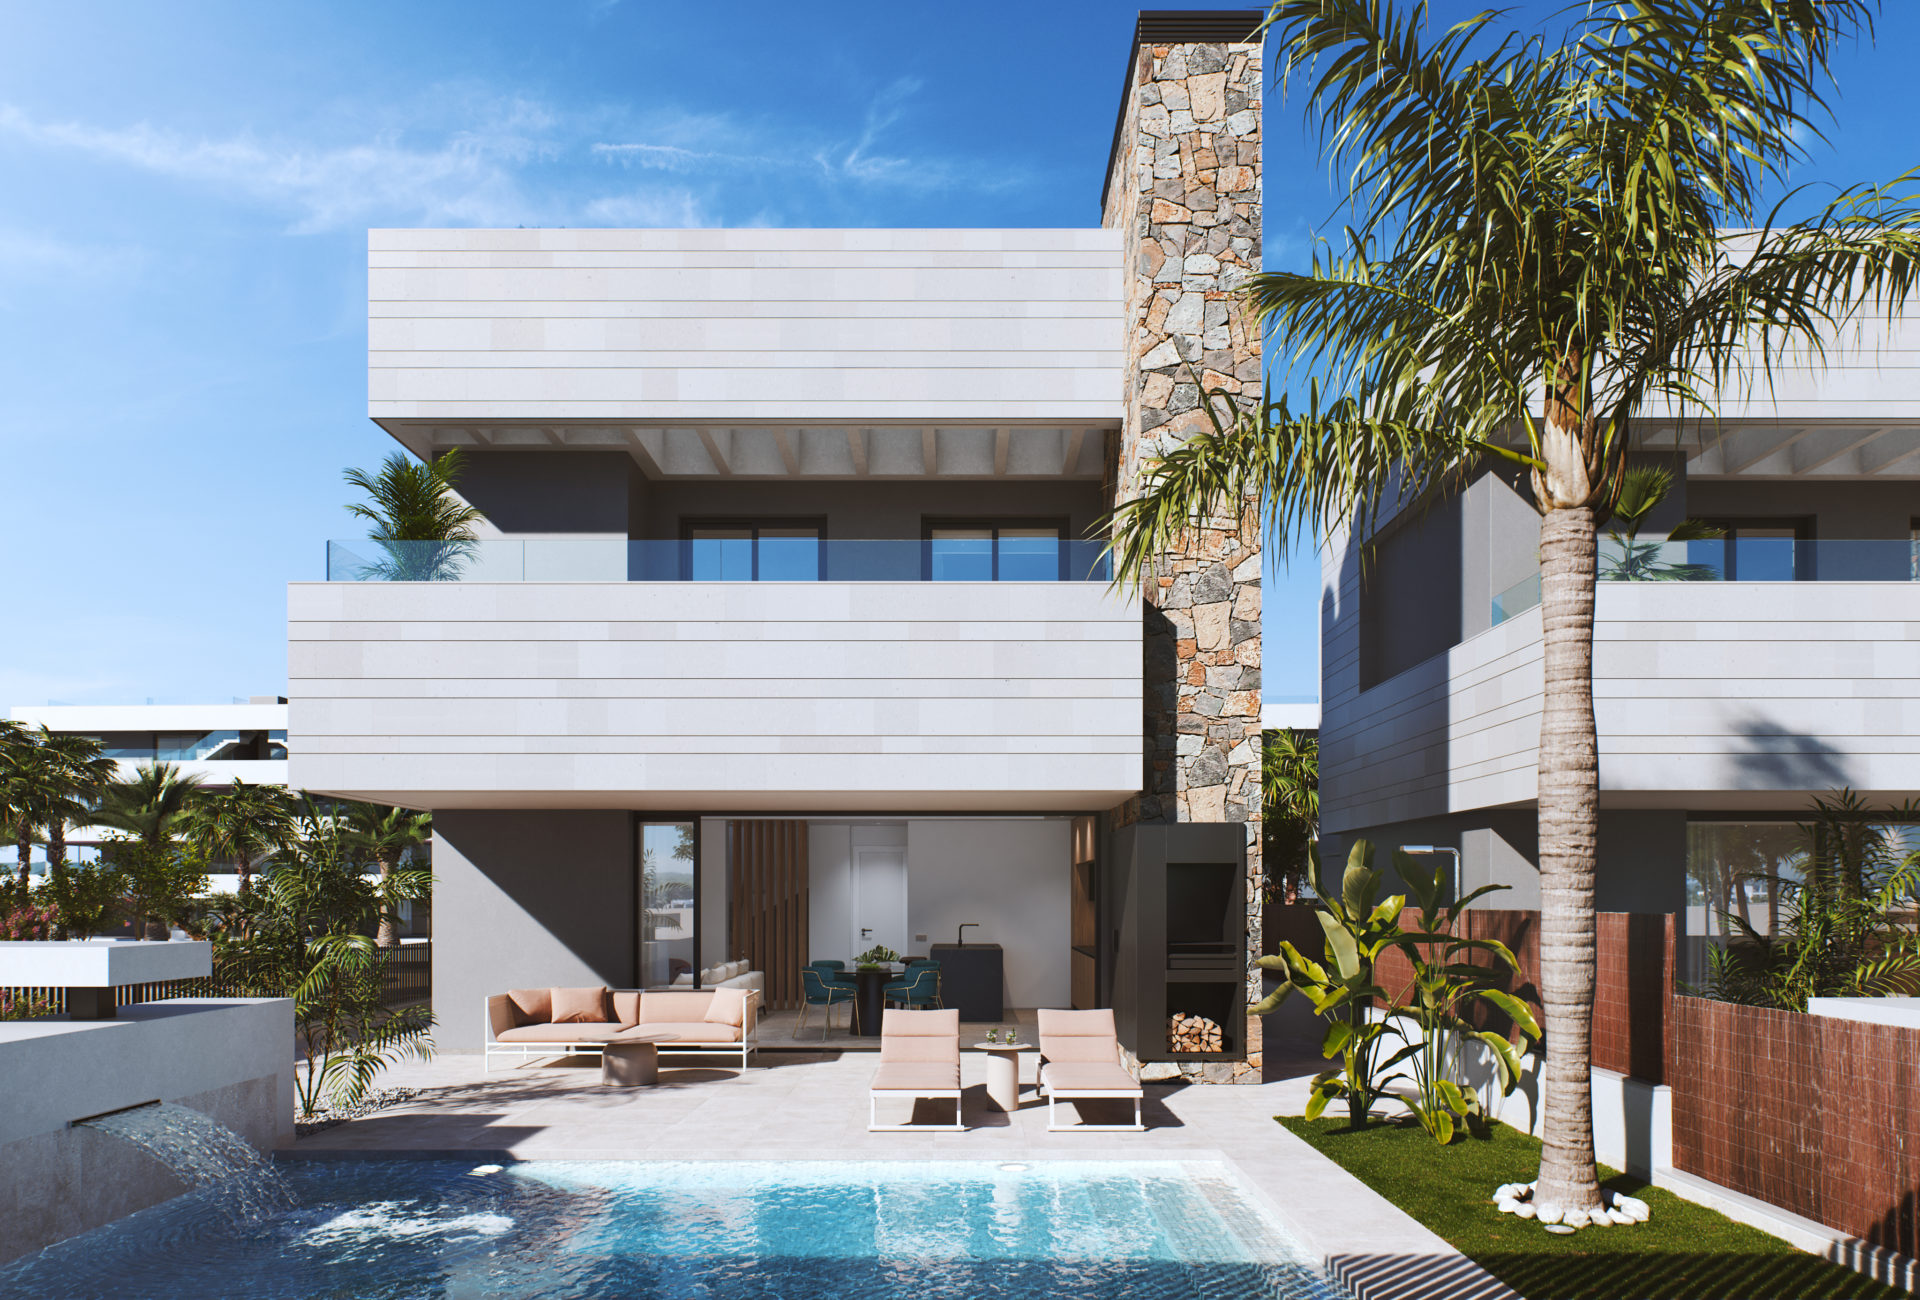 Santa Rosalia Almendro 3 Bedroom 3 Bathroom Villa with Private Pool 2